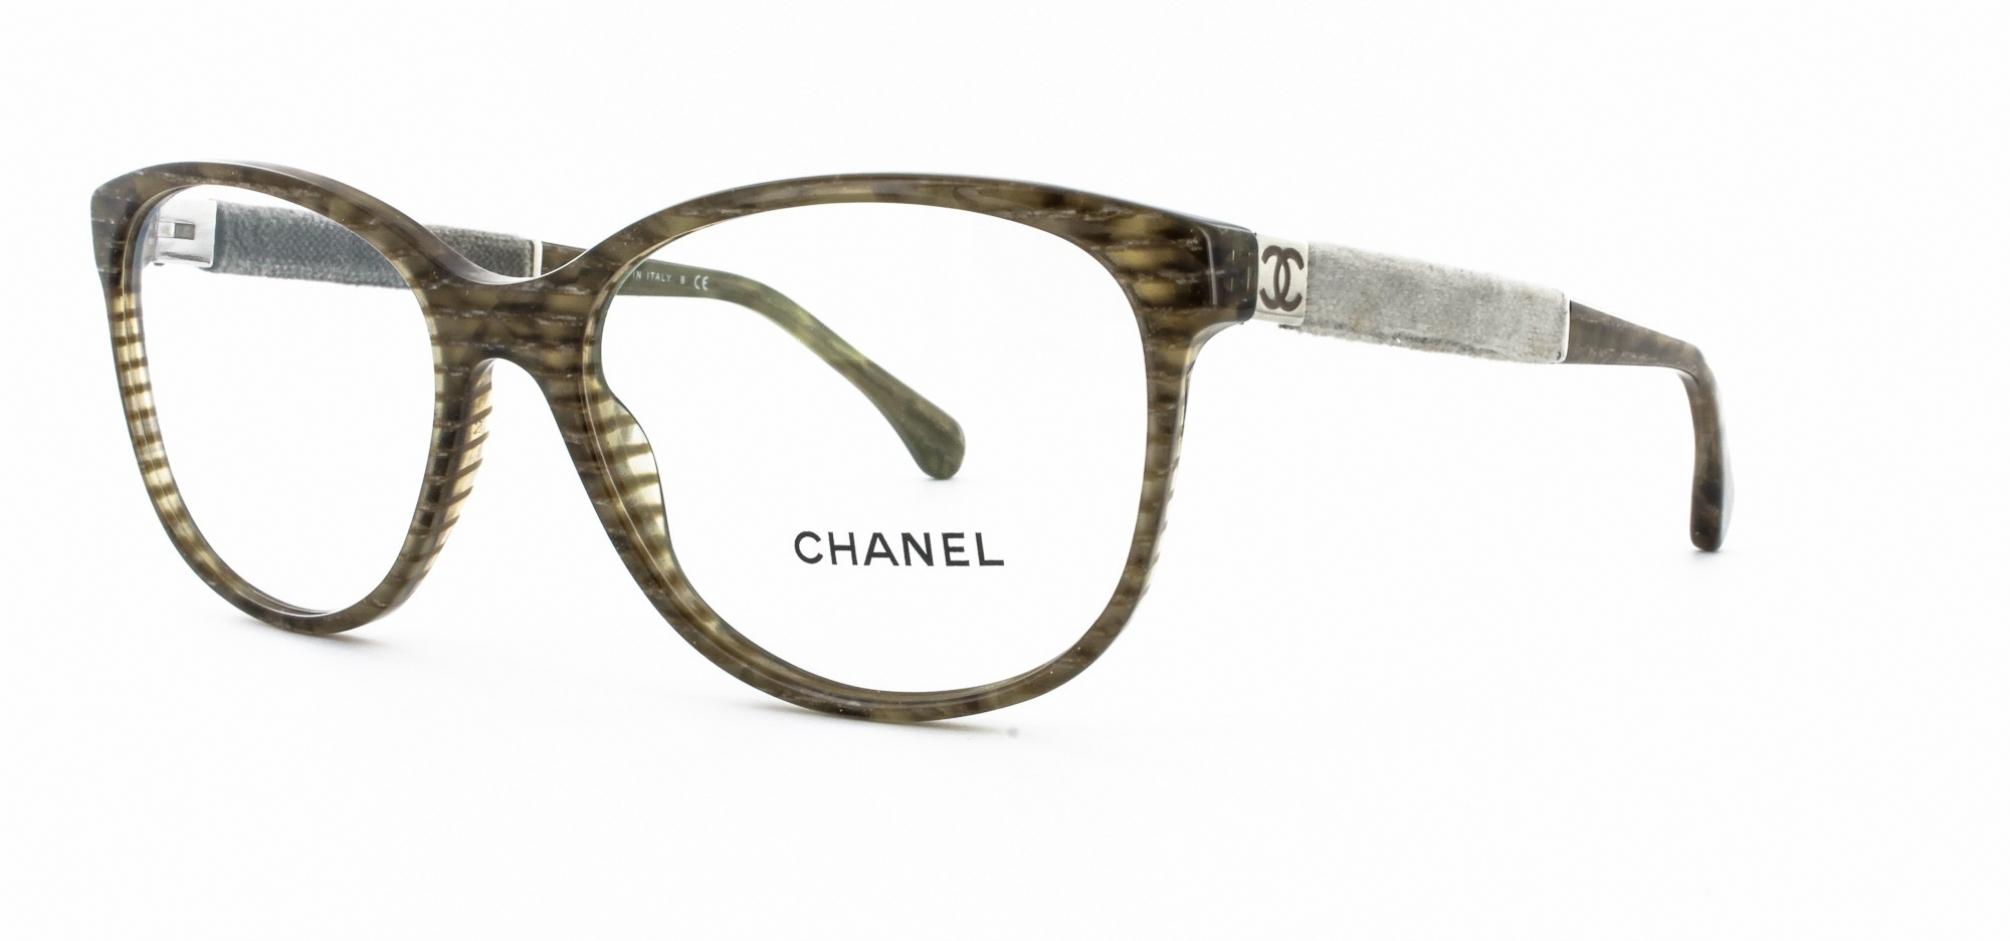 Chanel Frame For Glasses : Chanel 3267 Eyeglasses